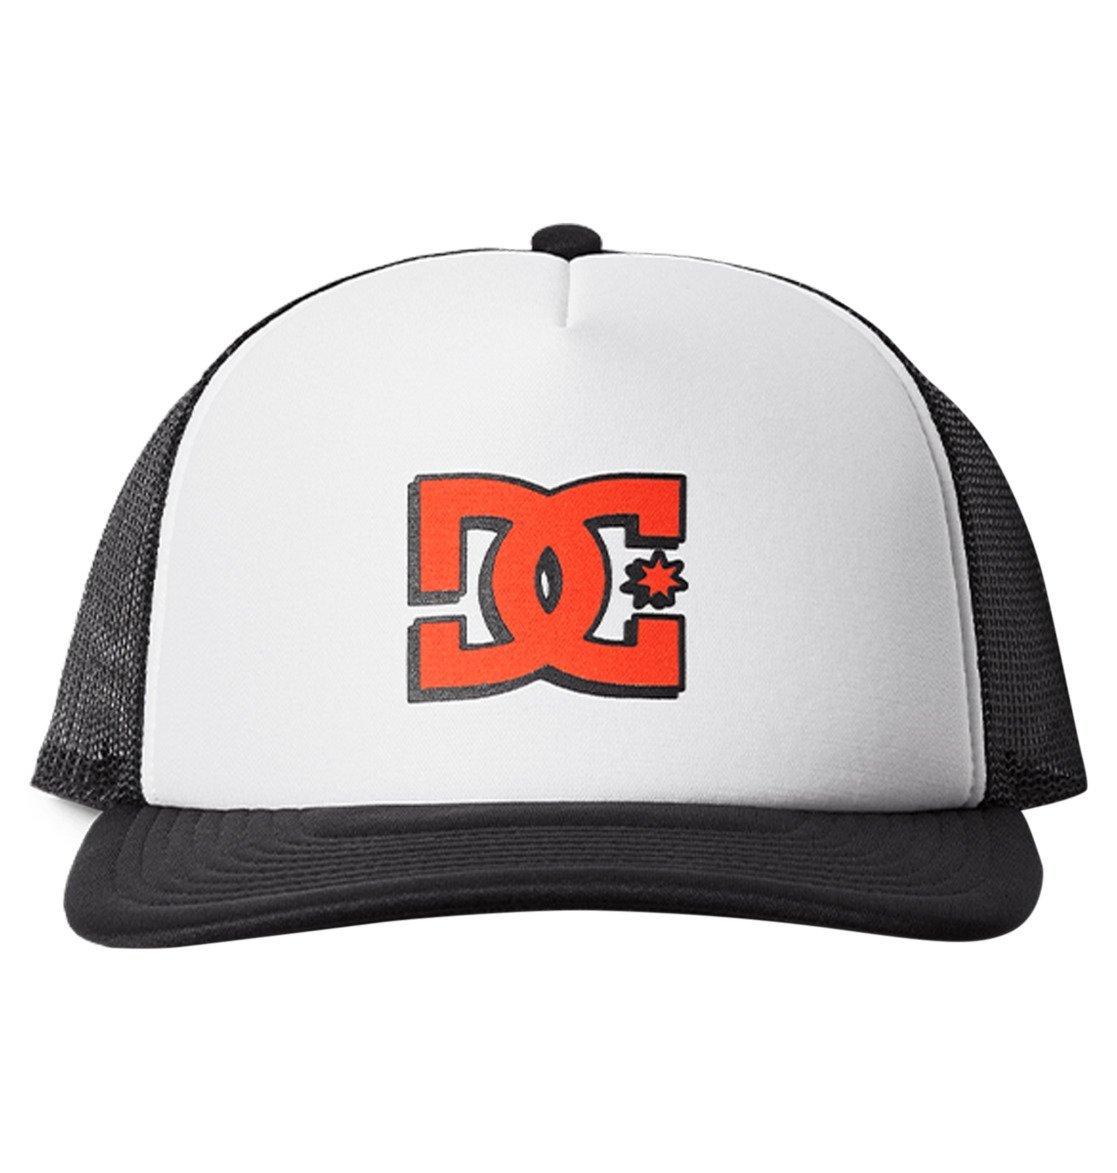 DC Bob's Burgers Trucker Hat